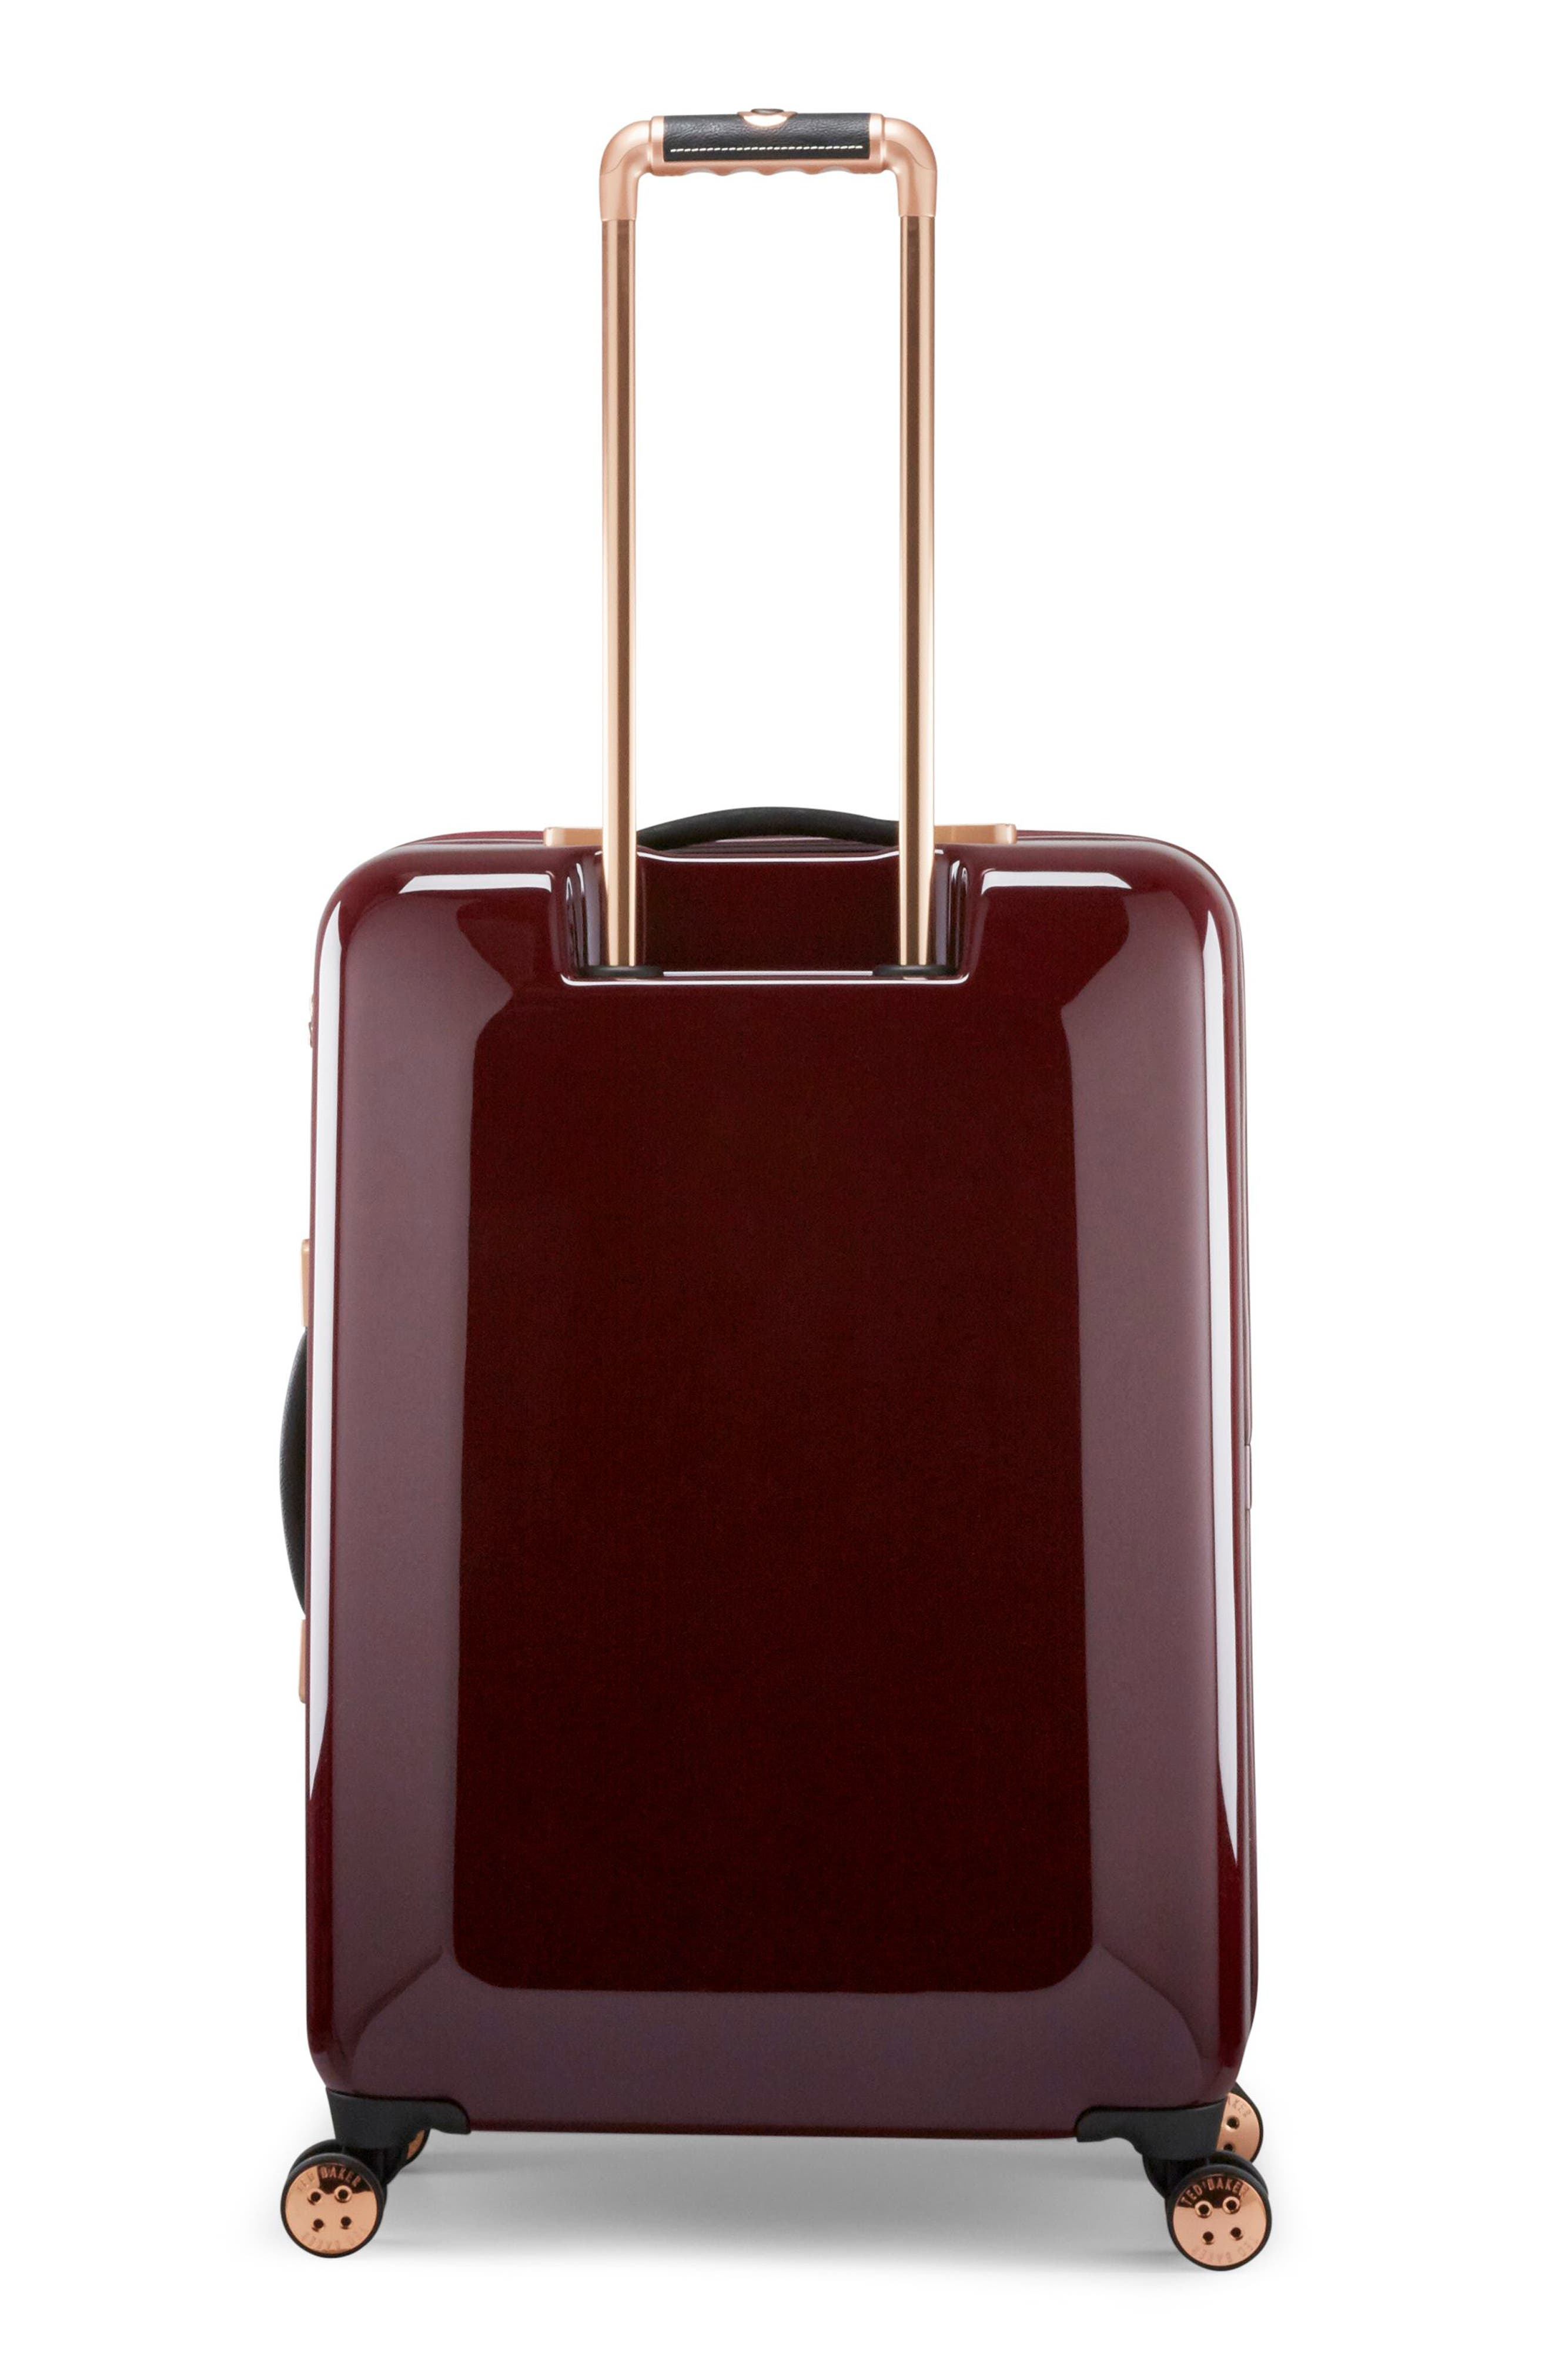 Medium Porcelain Rose 27-Inch Hard Shell Spinner Suitcase,                             Alternate thumbnail 4, color,                             930